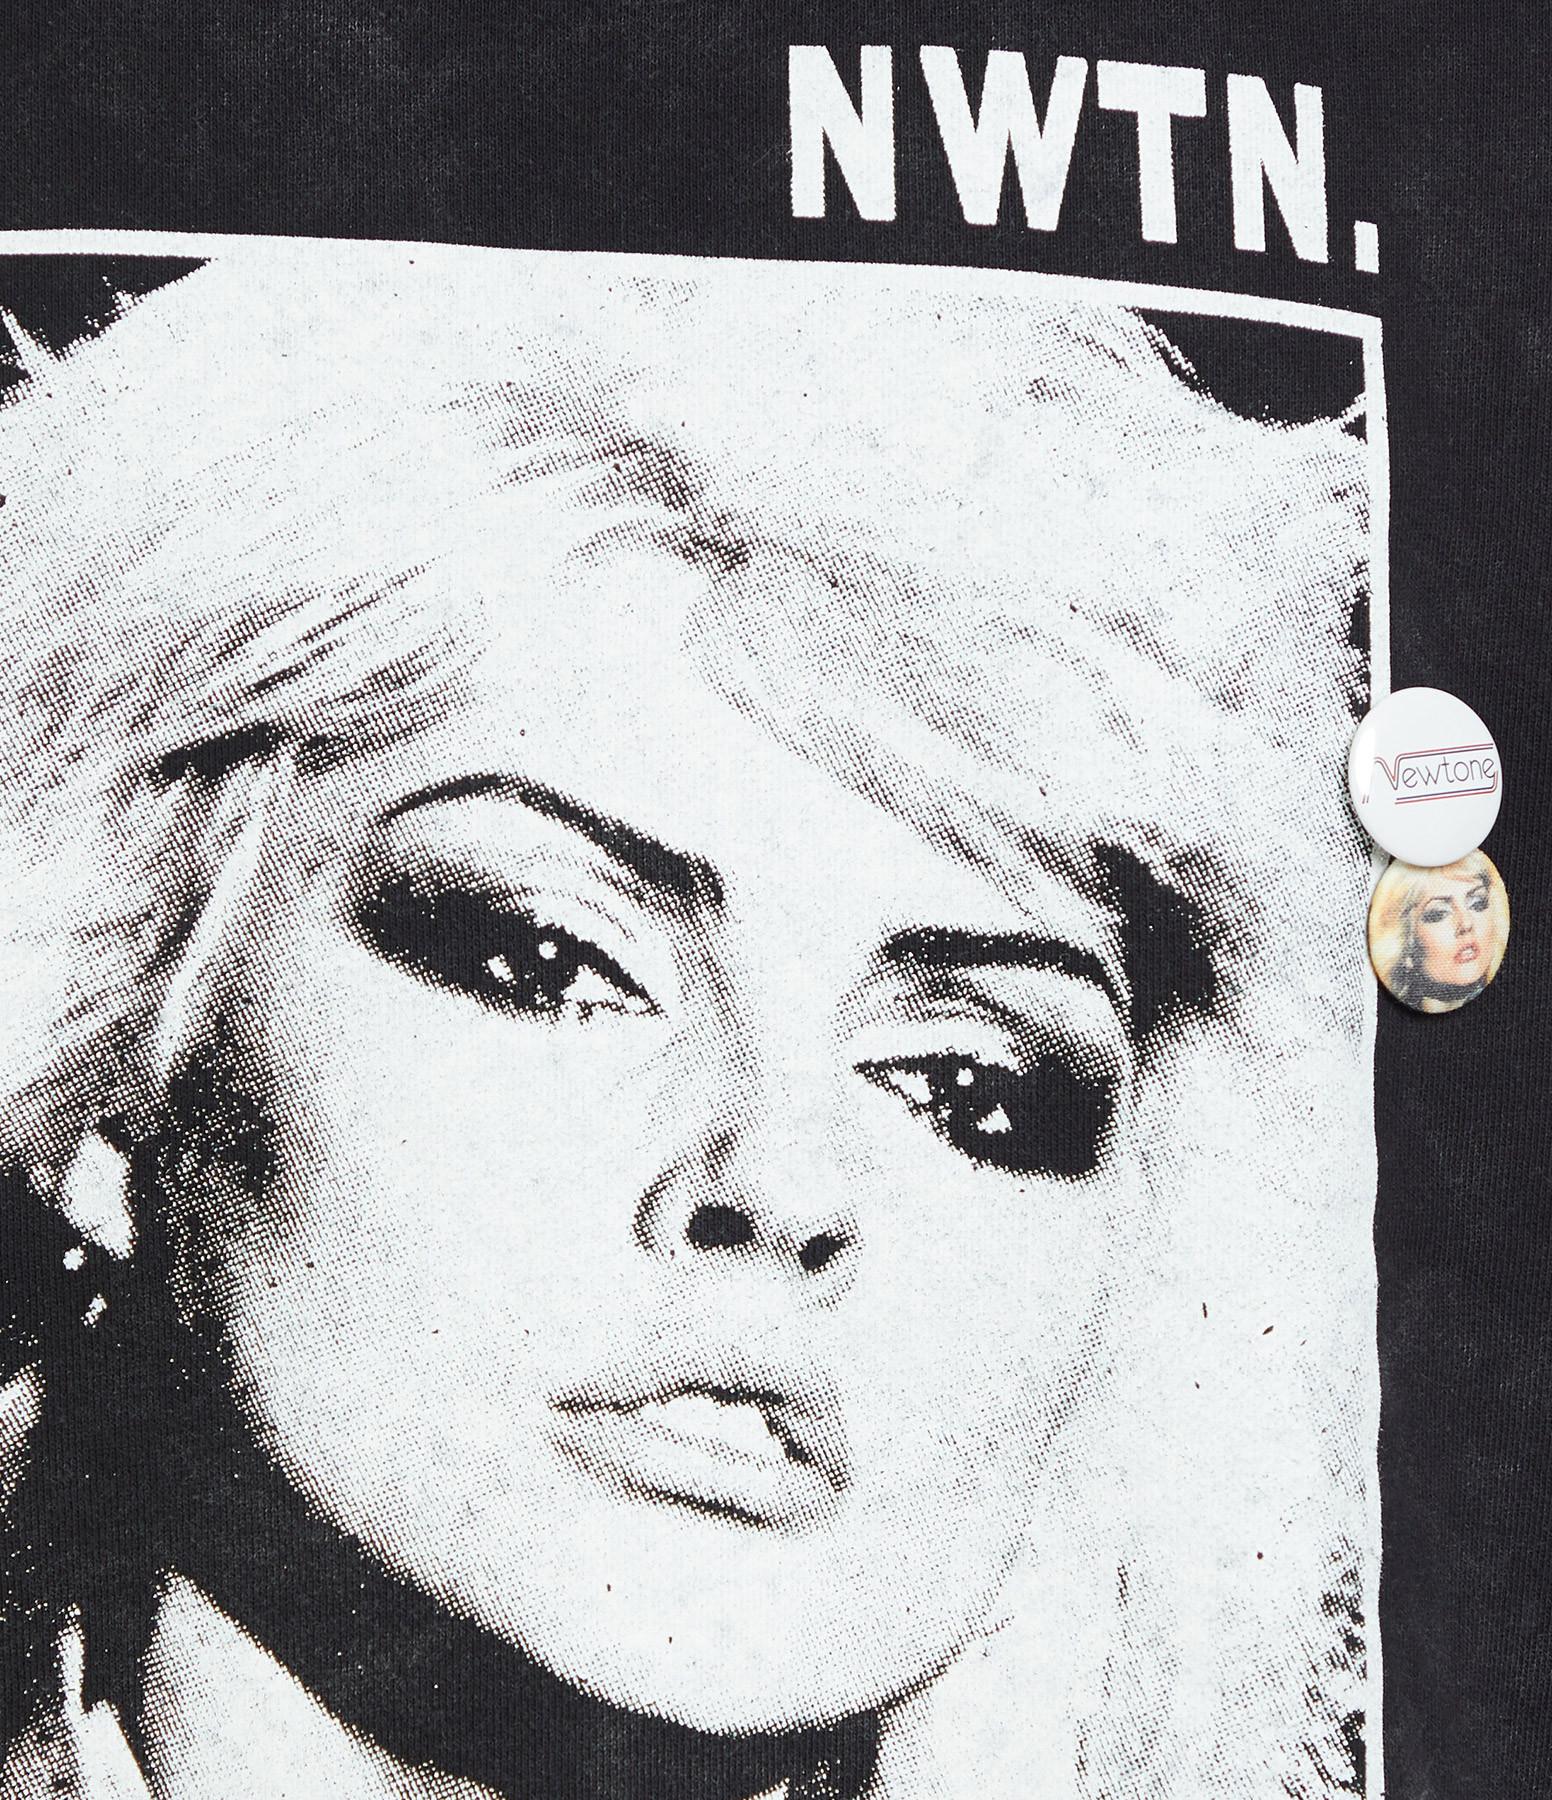 NEWTONE - Sweatshirt Roller Boulevard Coton Noir